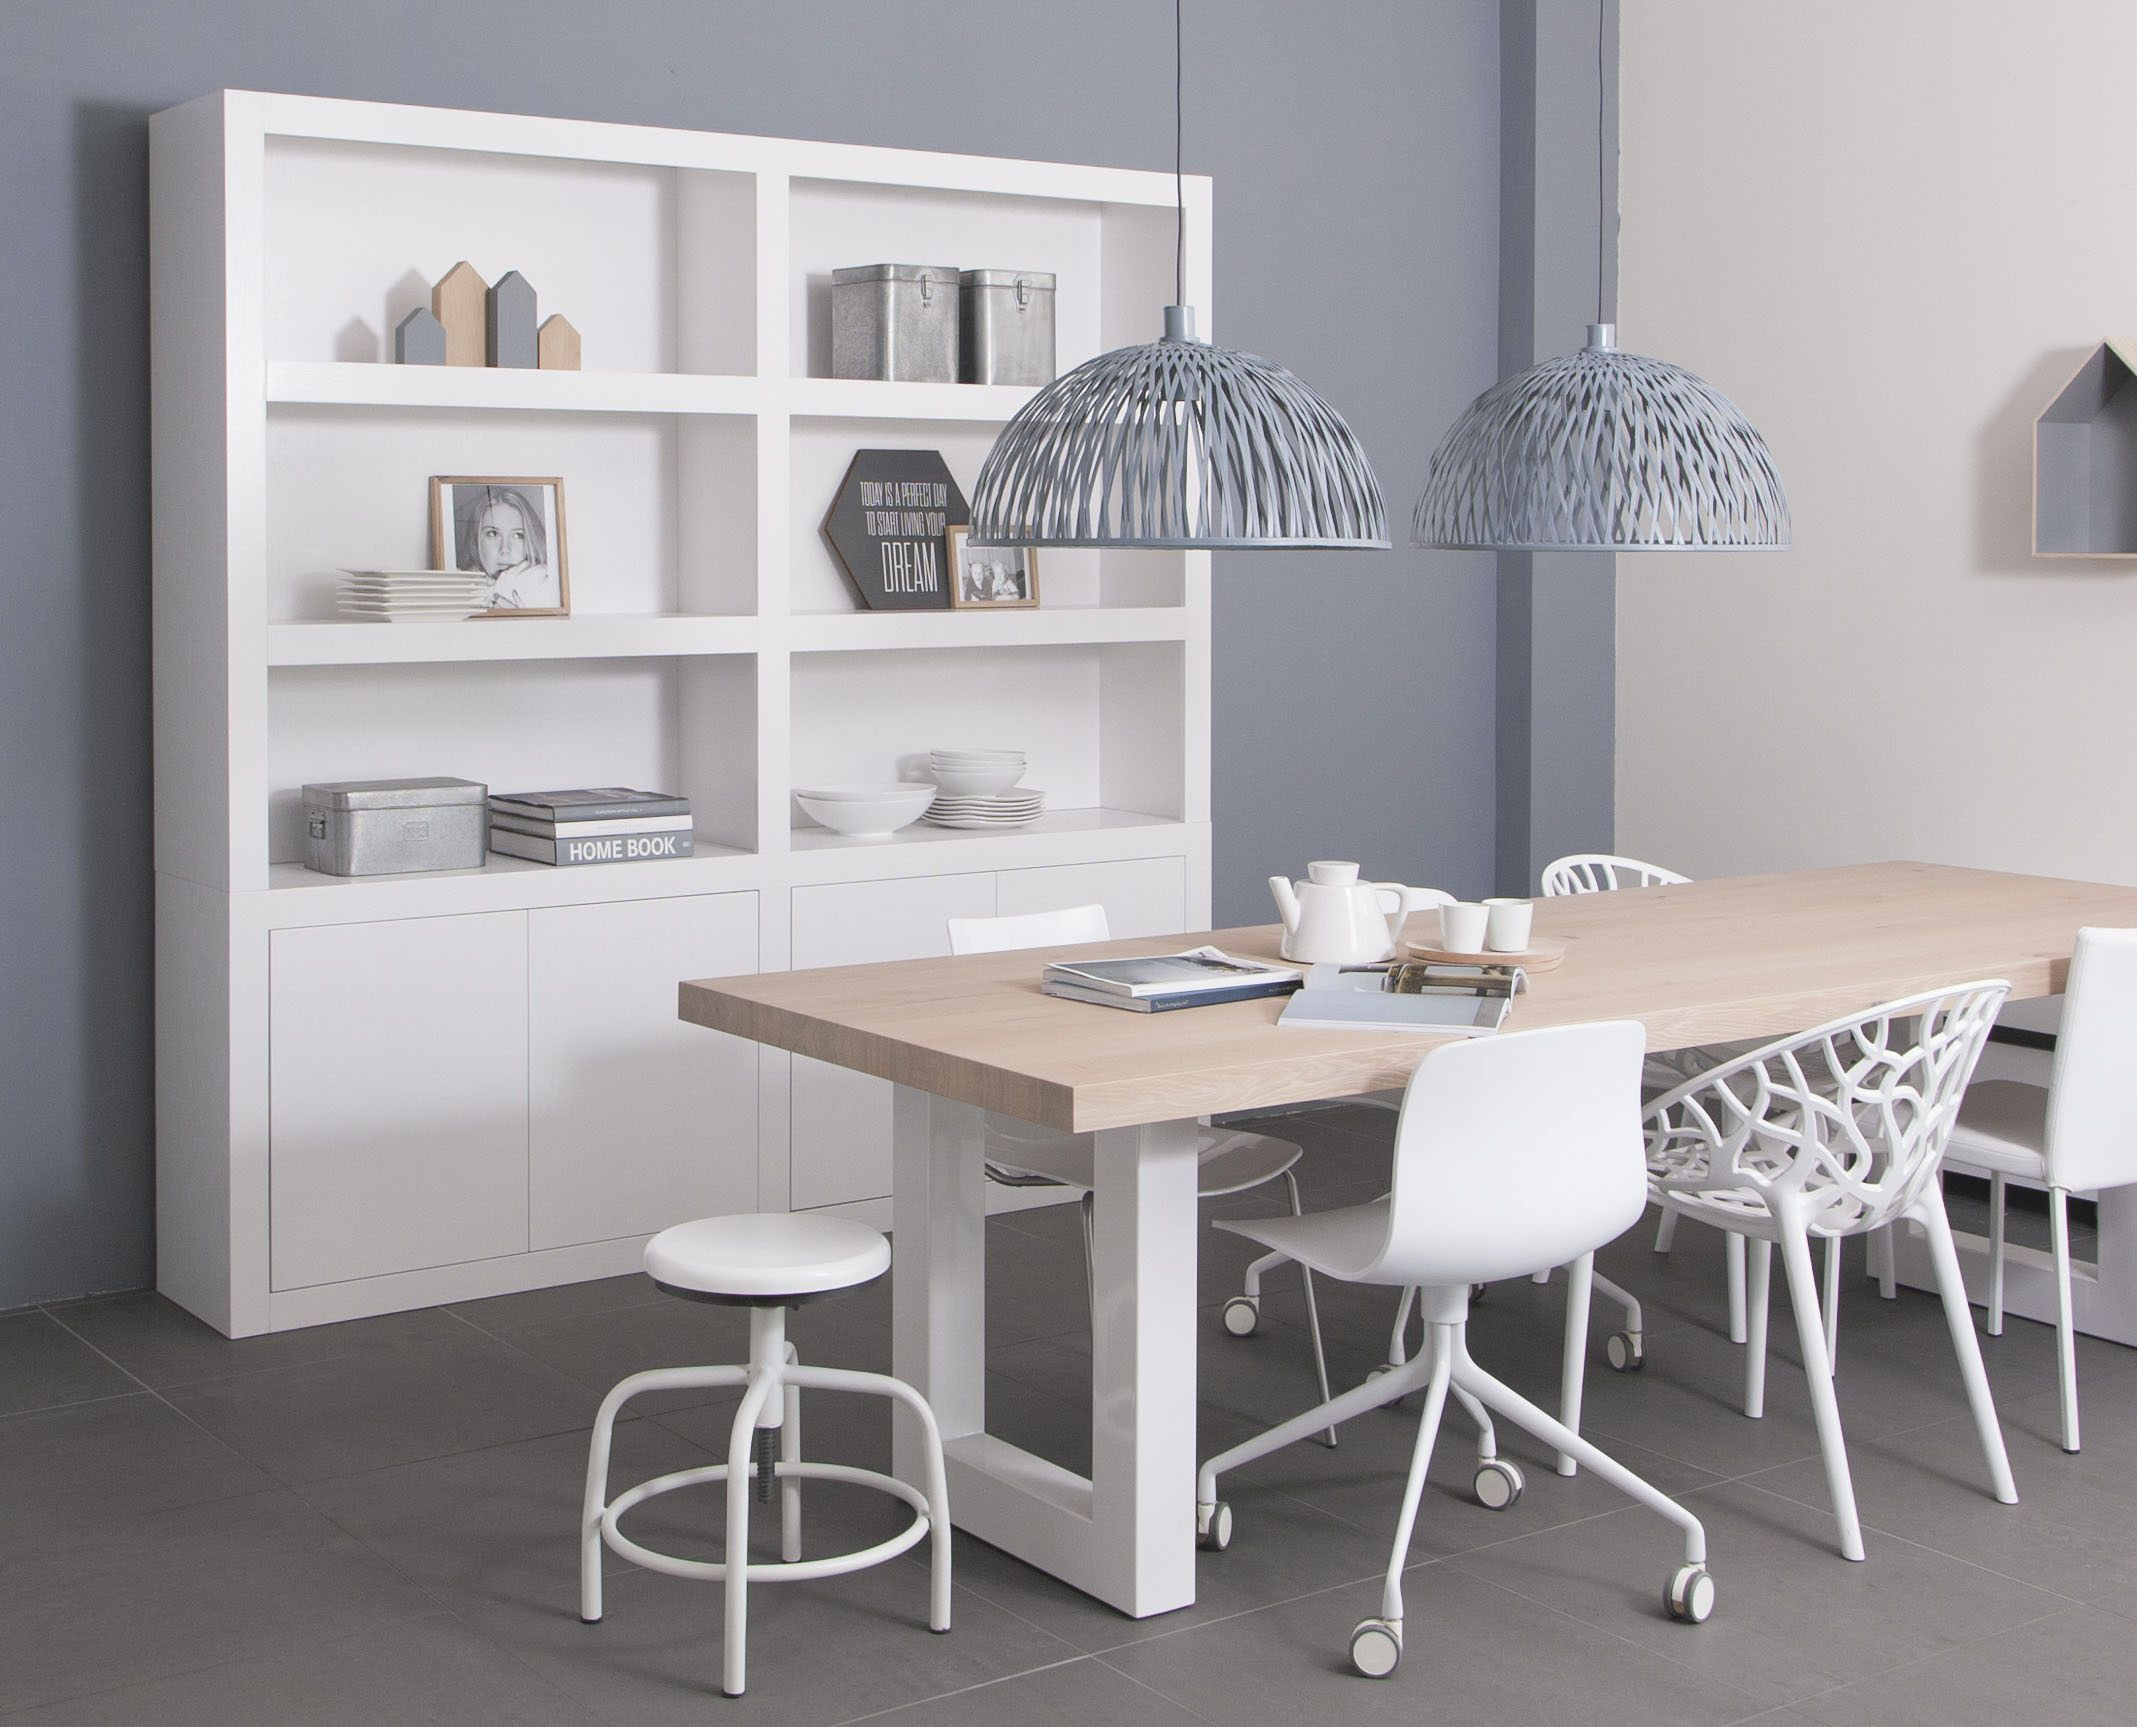 Wonderbaar ikea woonkamer samenstellen tafel op schragen